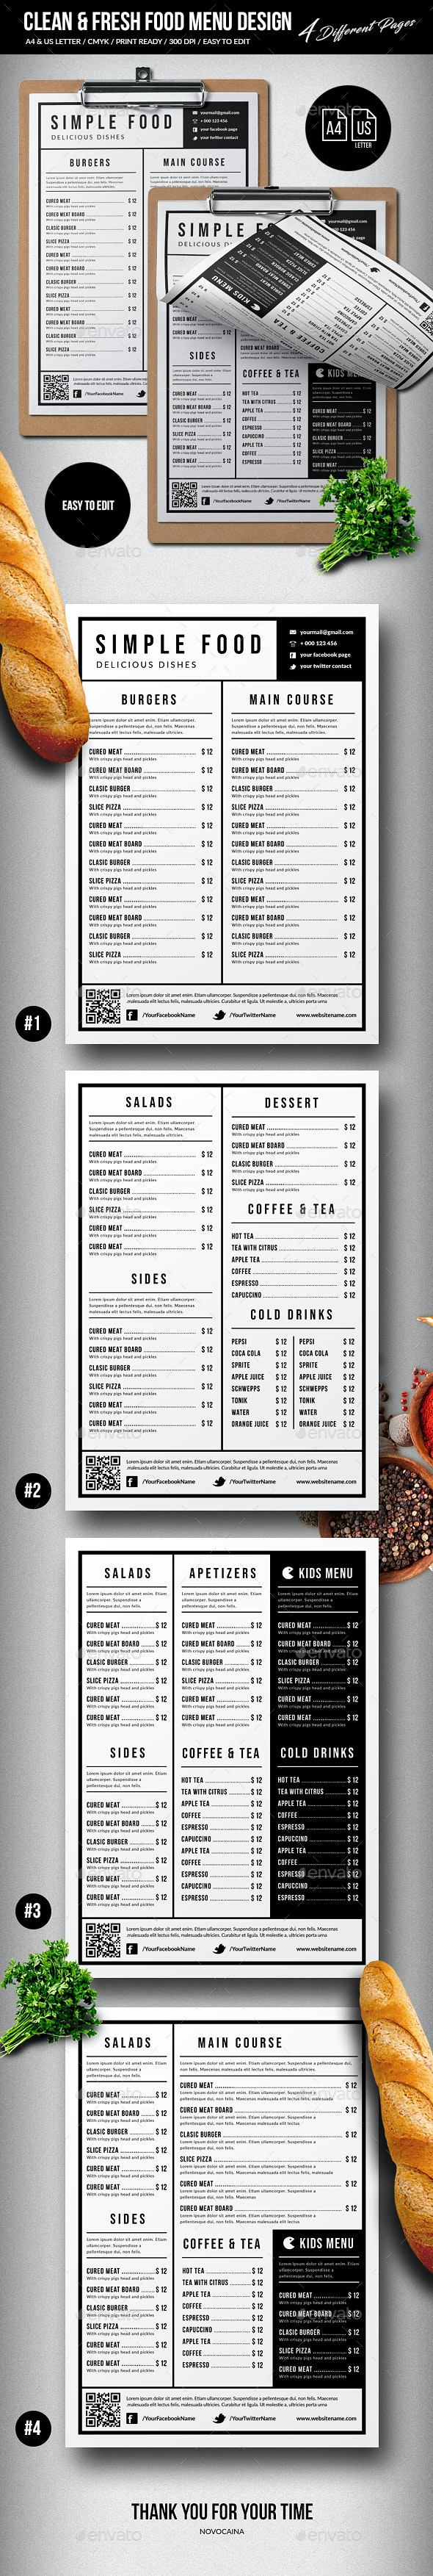 Clean & Fresh Single Page Menu - 4 Pages - A4 & US Letter - Food Menus Print Templates